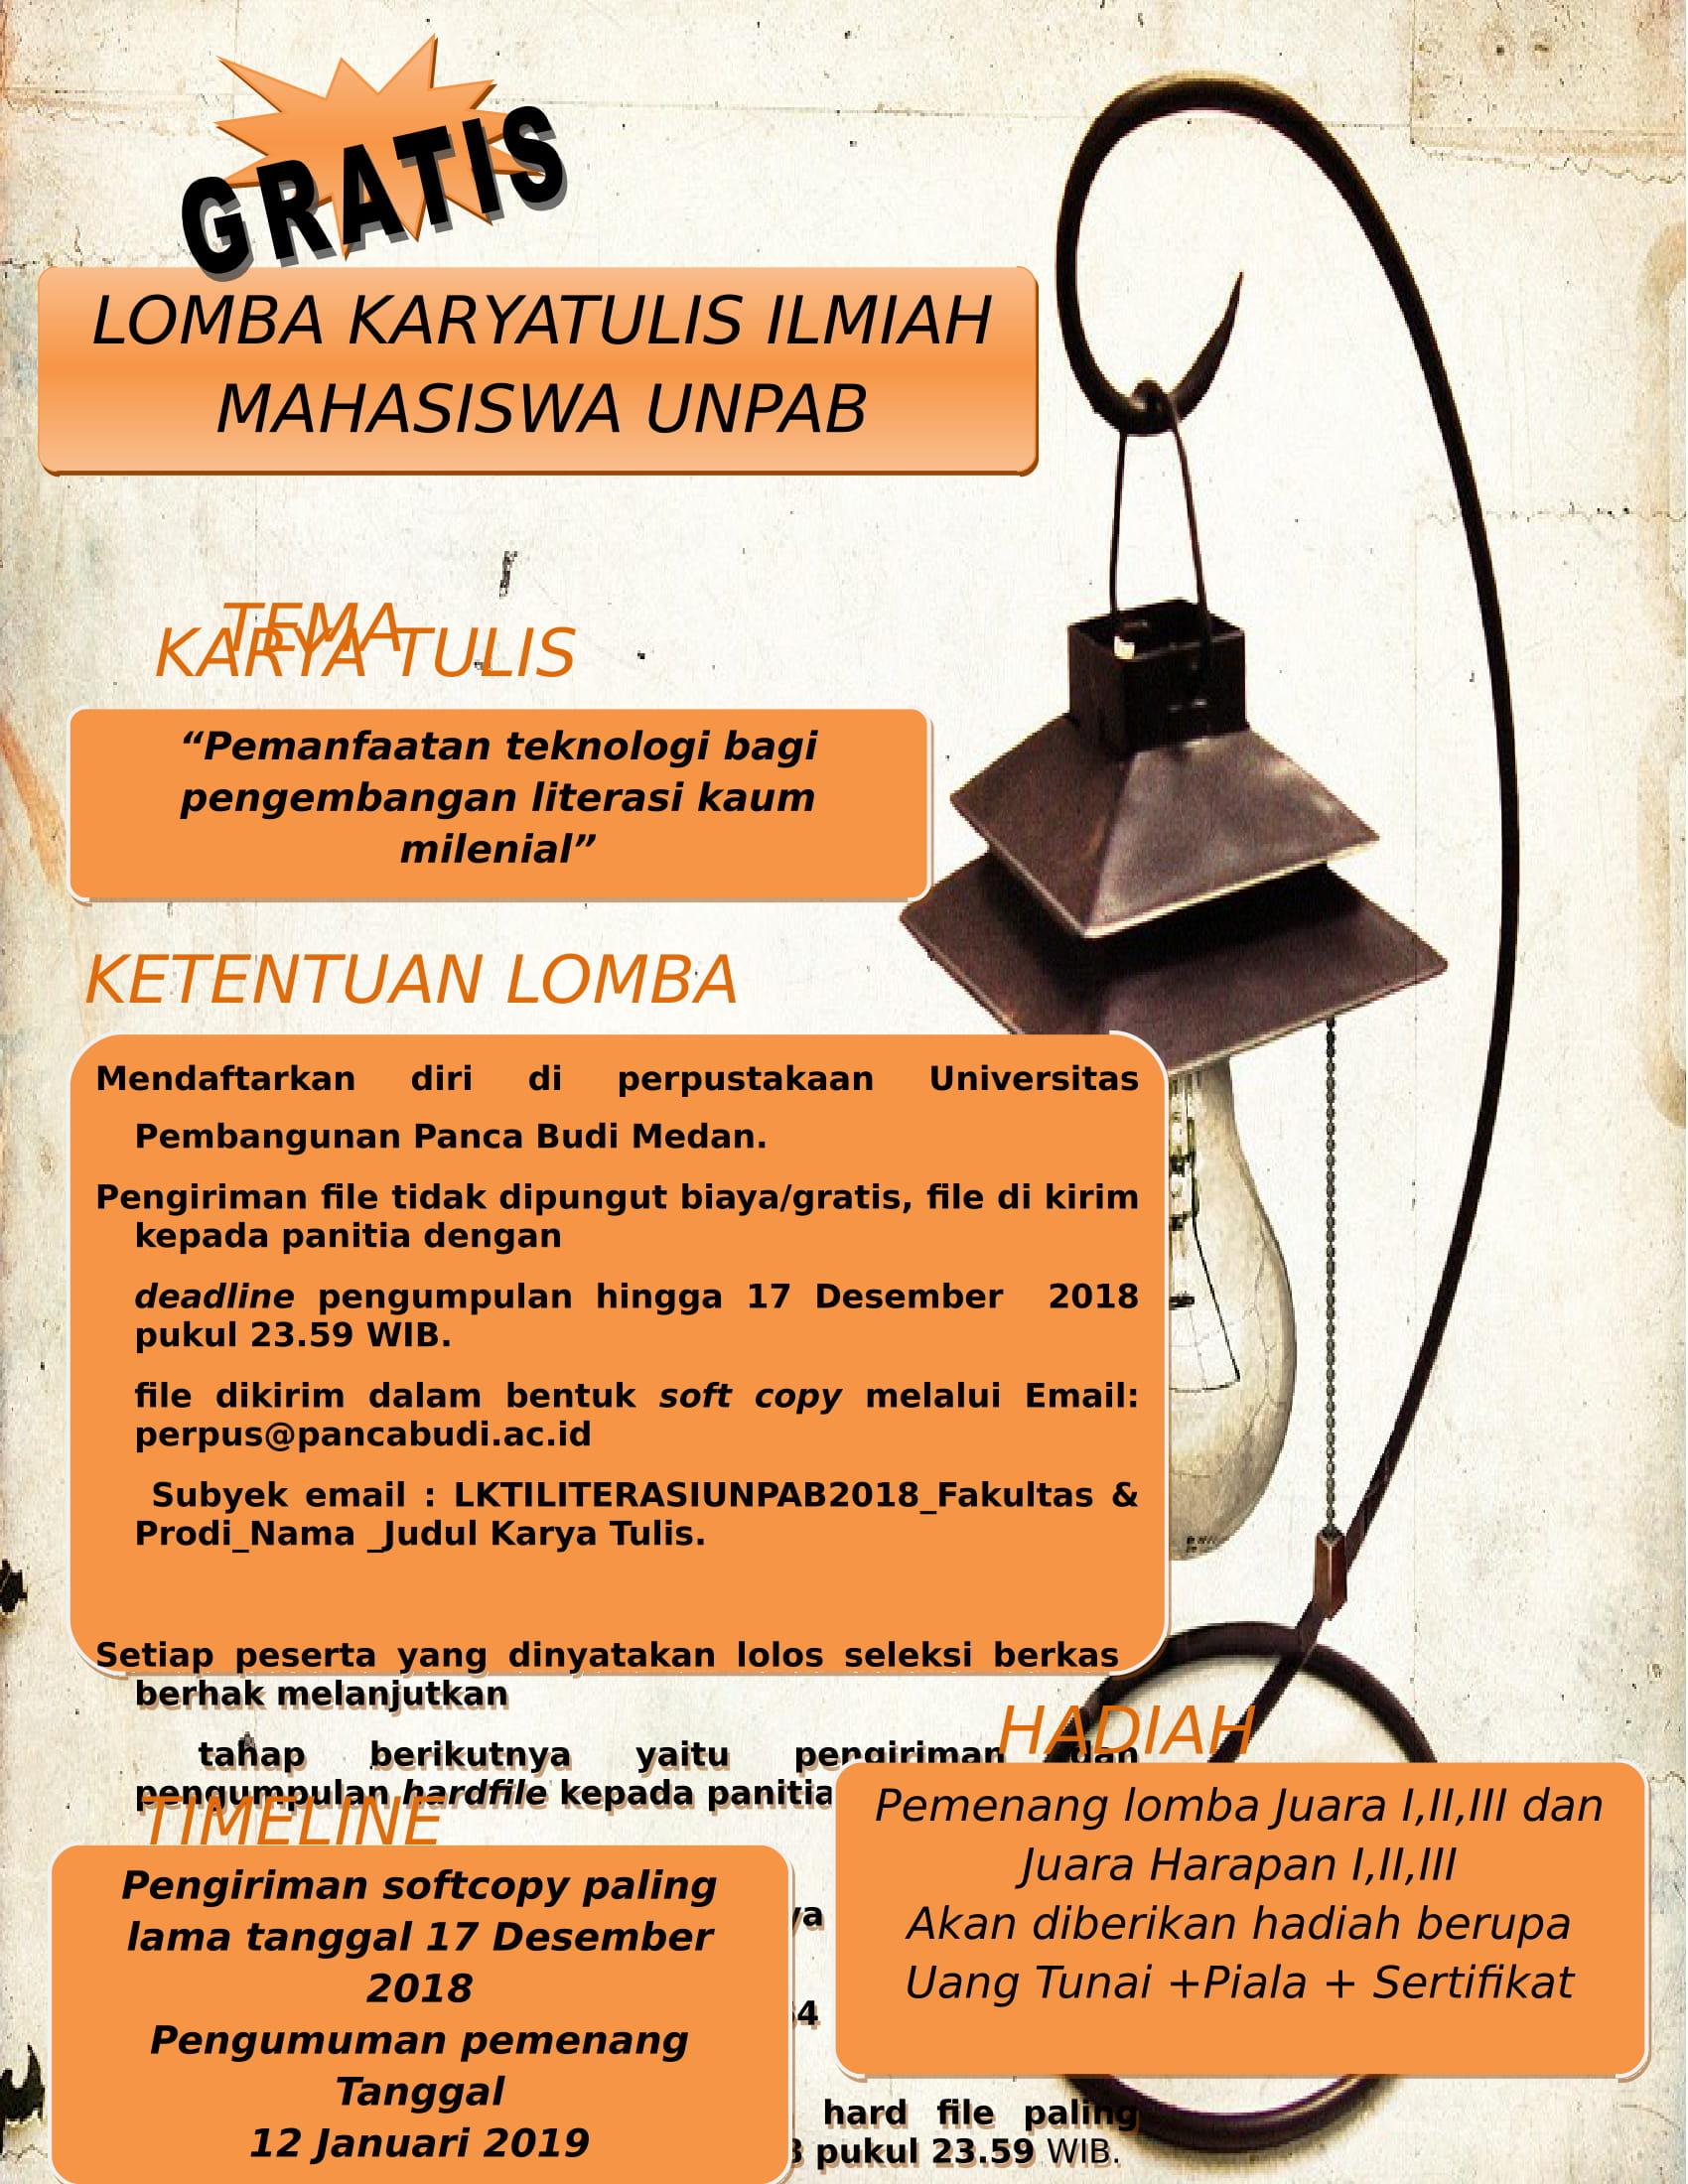 Lomba Karya Tulis Ilmiah (LKTI) Perpustakaan Unpab Medan